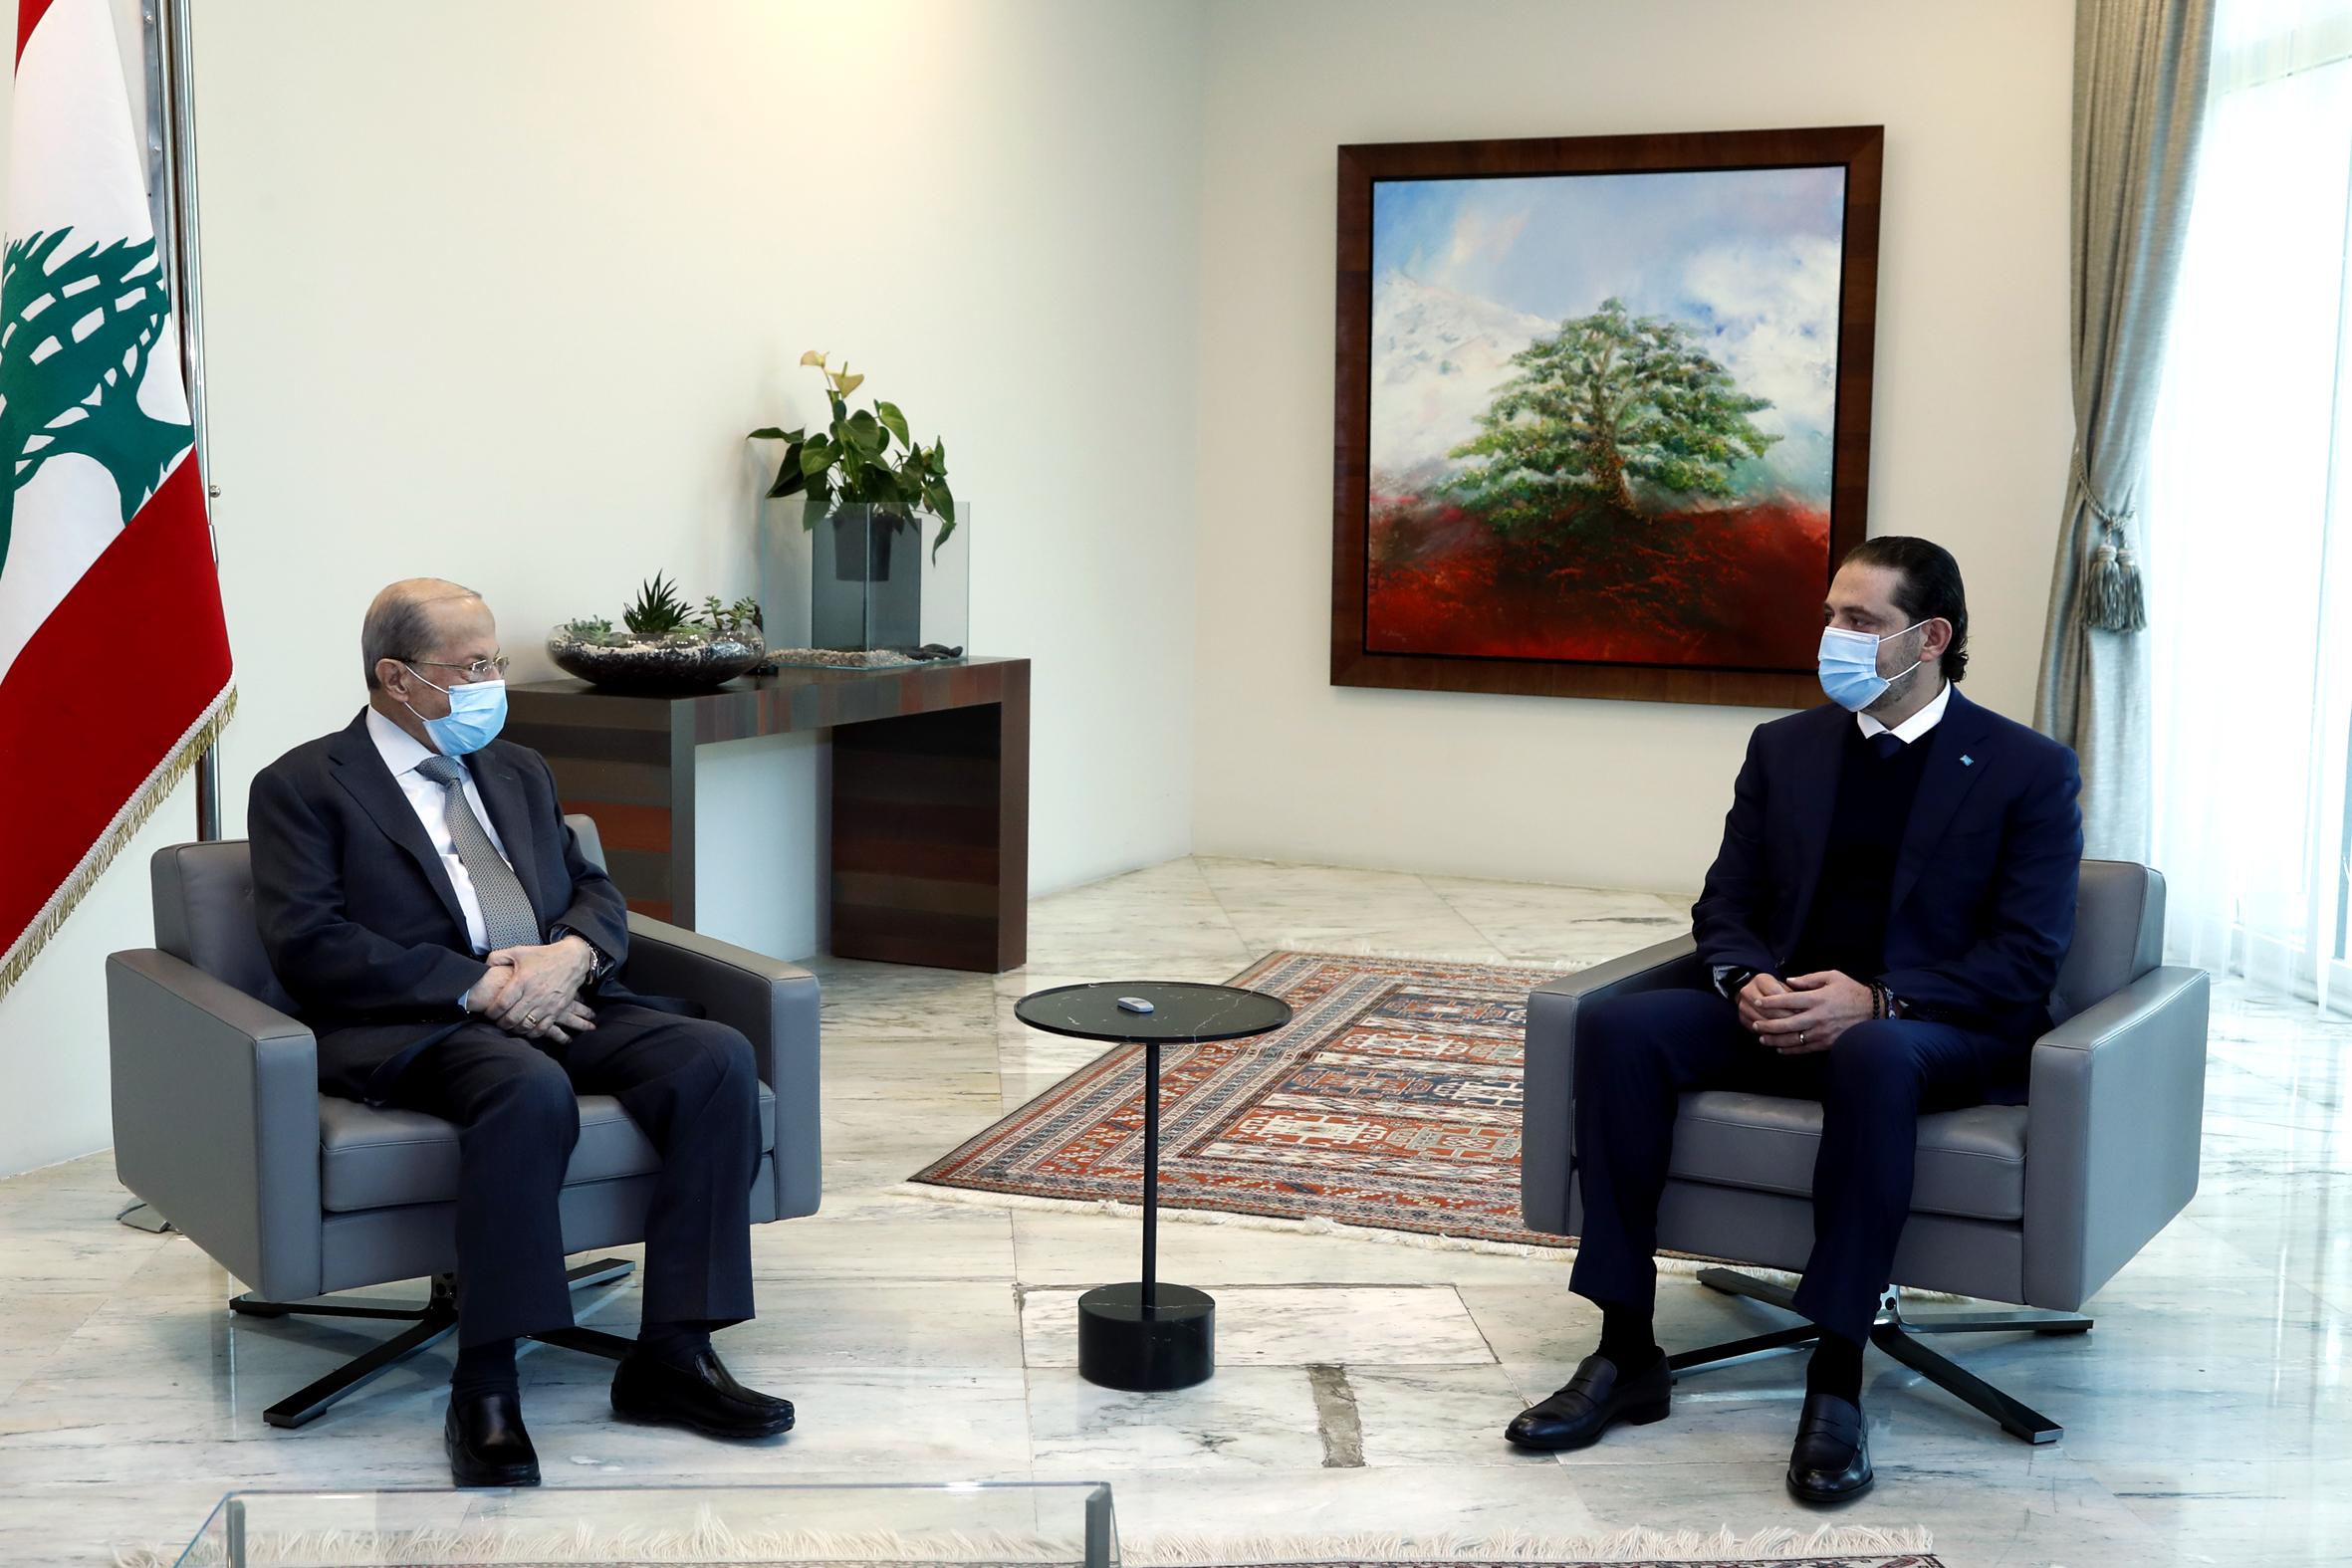 2 - President Michel Aoun meets Designated PM Saad Hariri